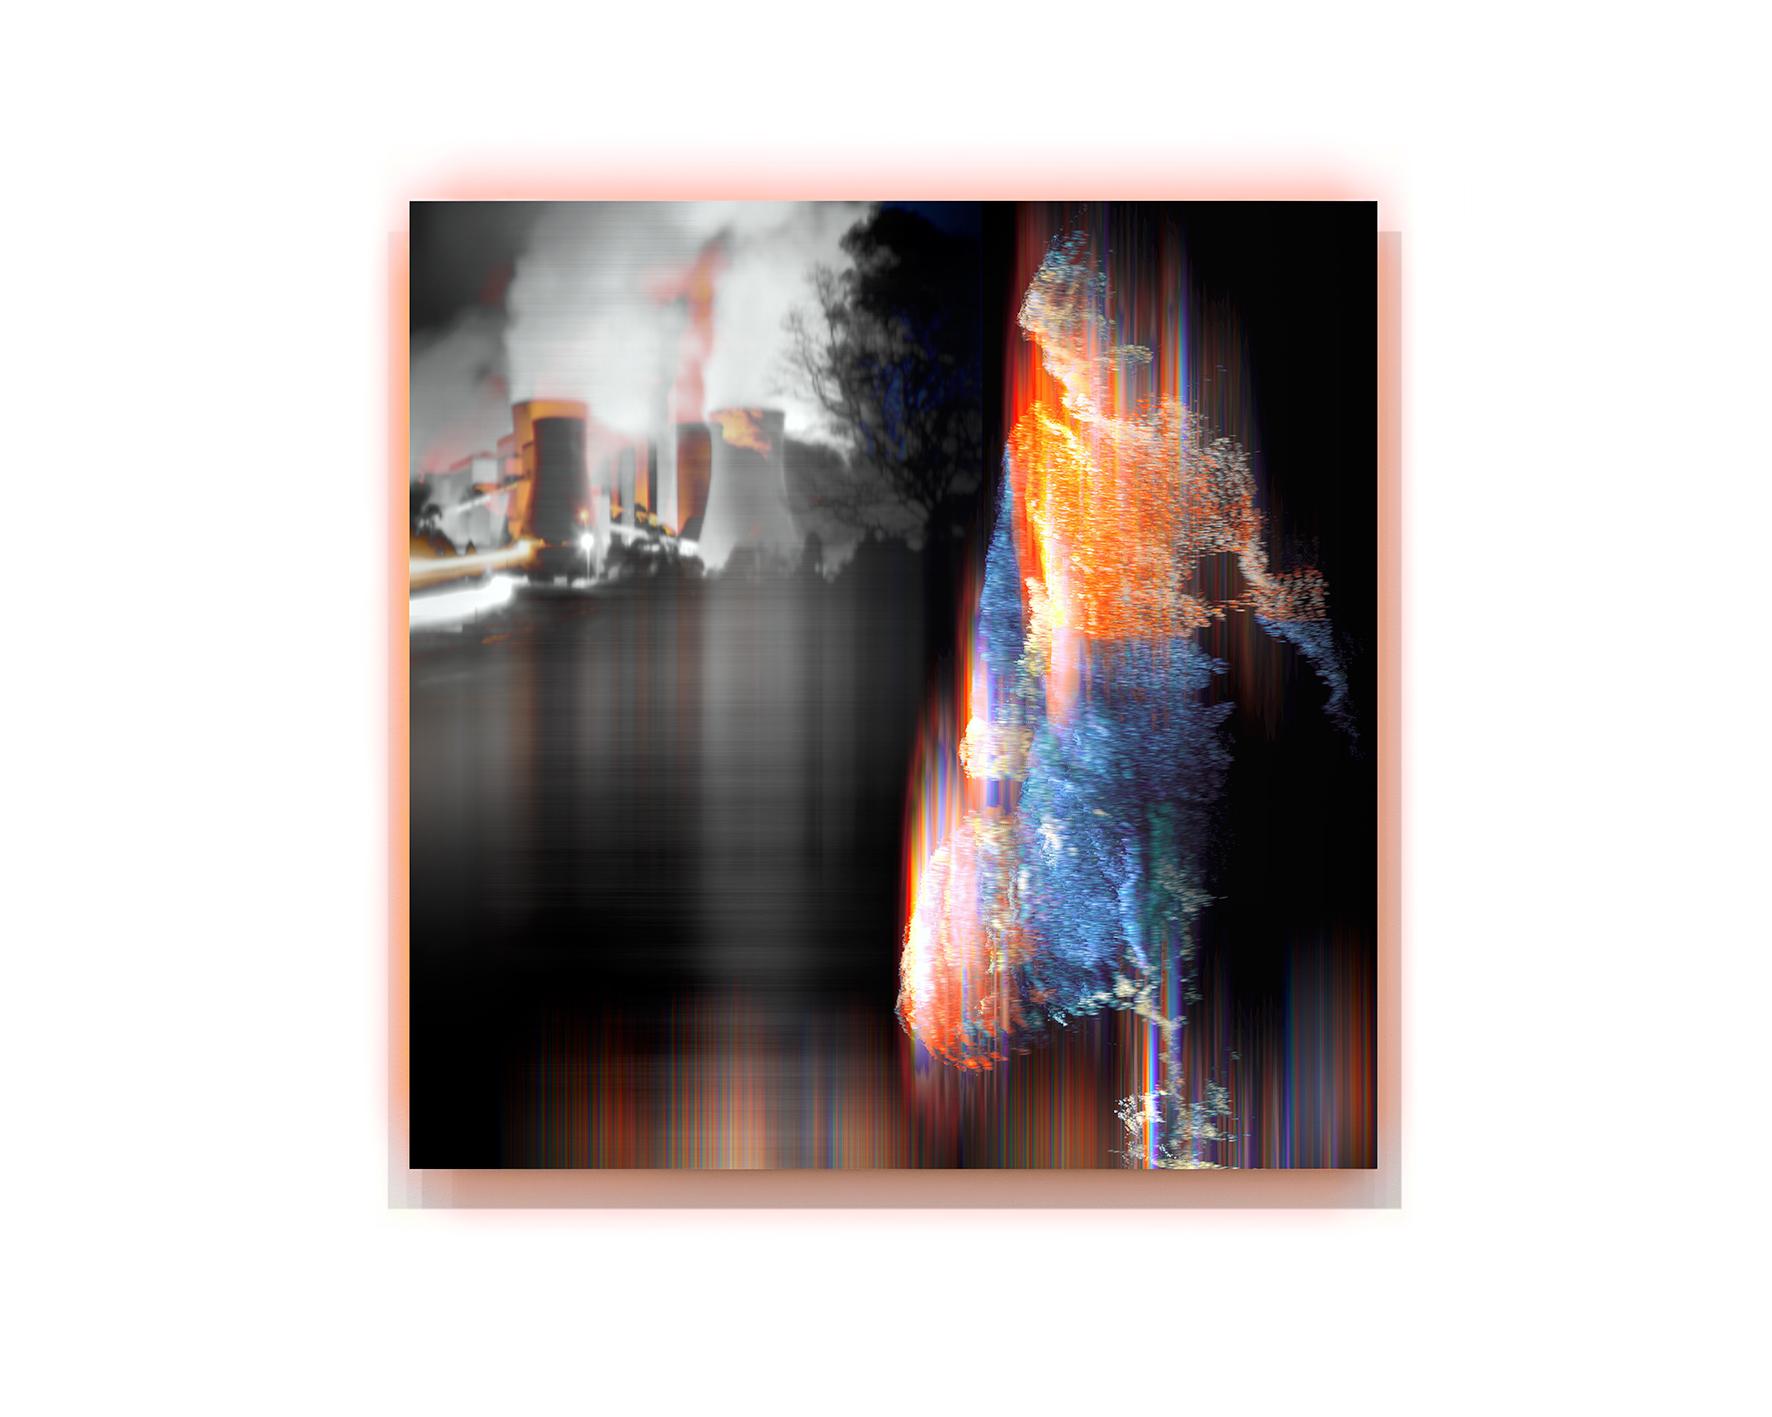 Night Shift  2018, pigment and enamel on aluminium, 120cm x 120cm